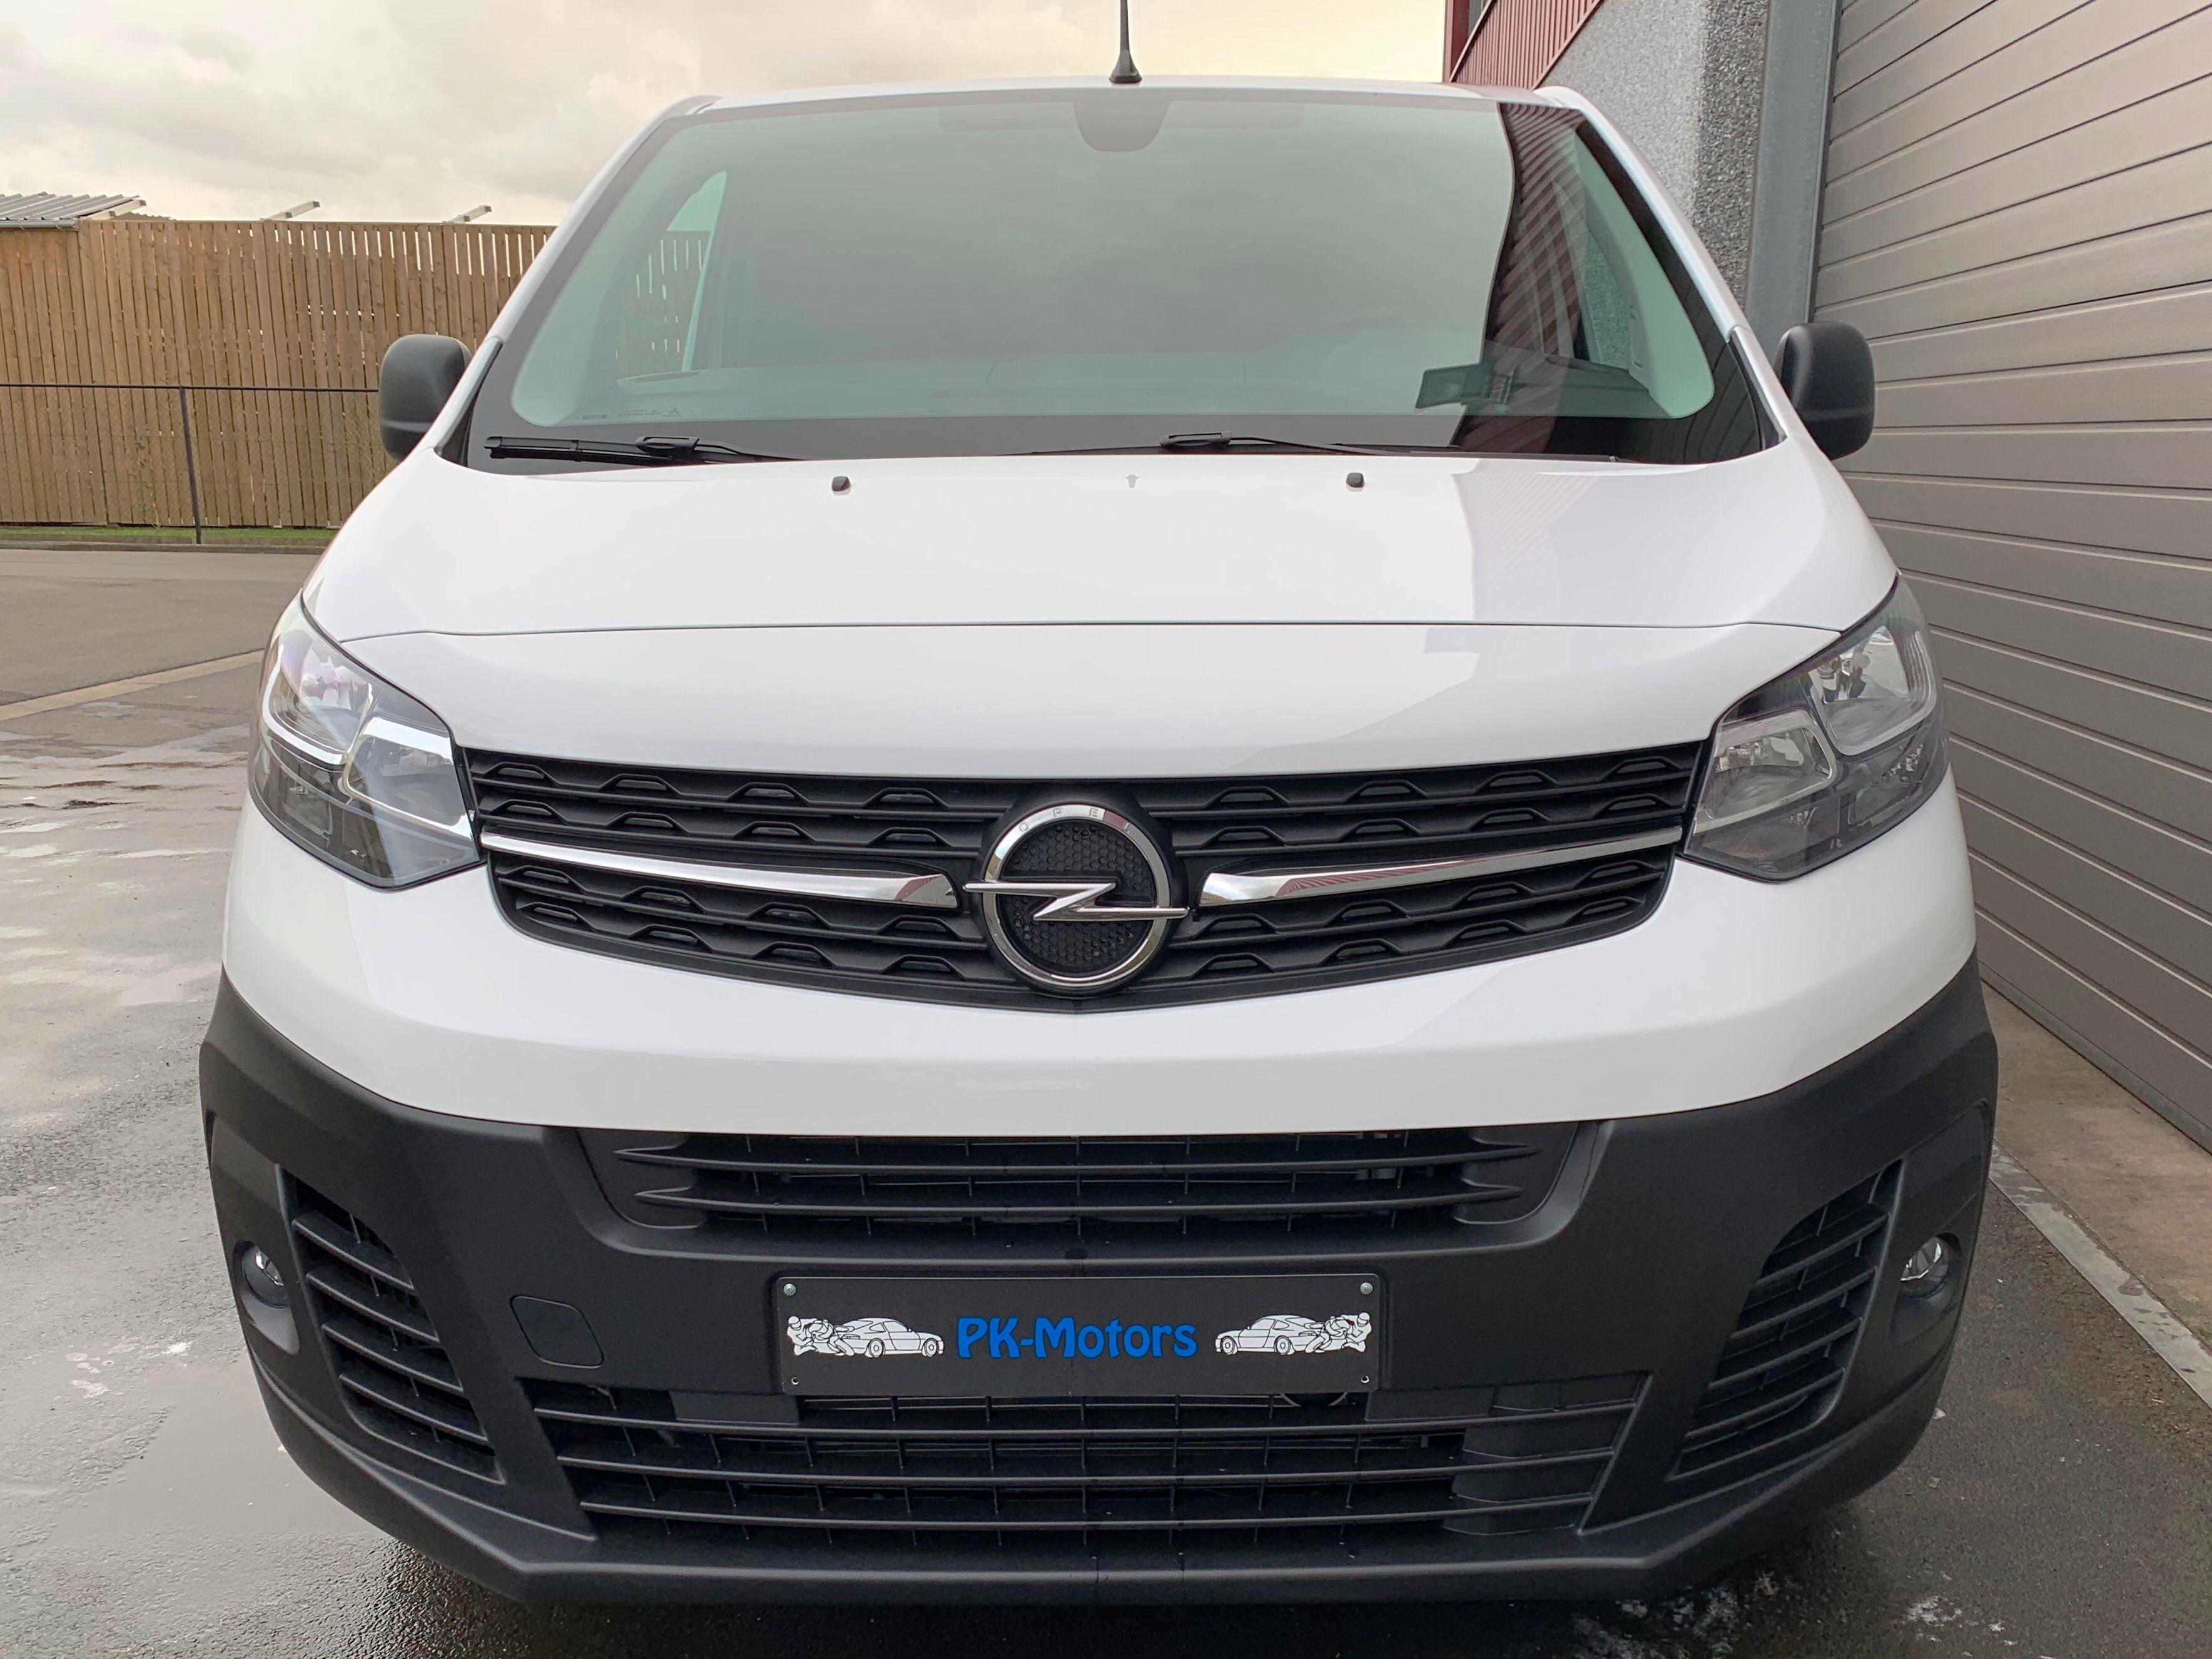 Opel Vivaro 2.0D 122PK Edition L3H1 NIEUW in stock 35% korting 3/29